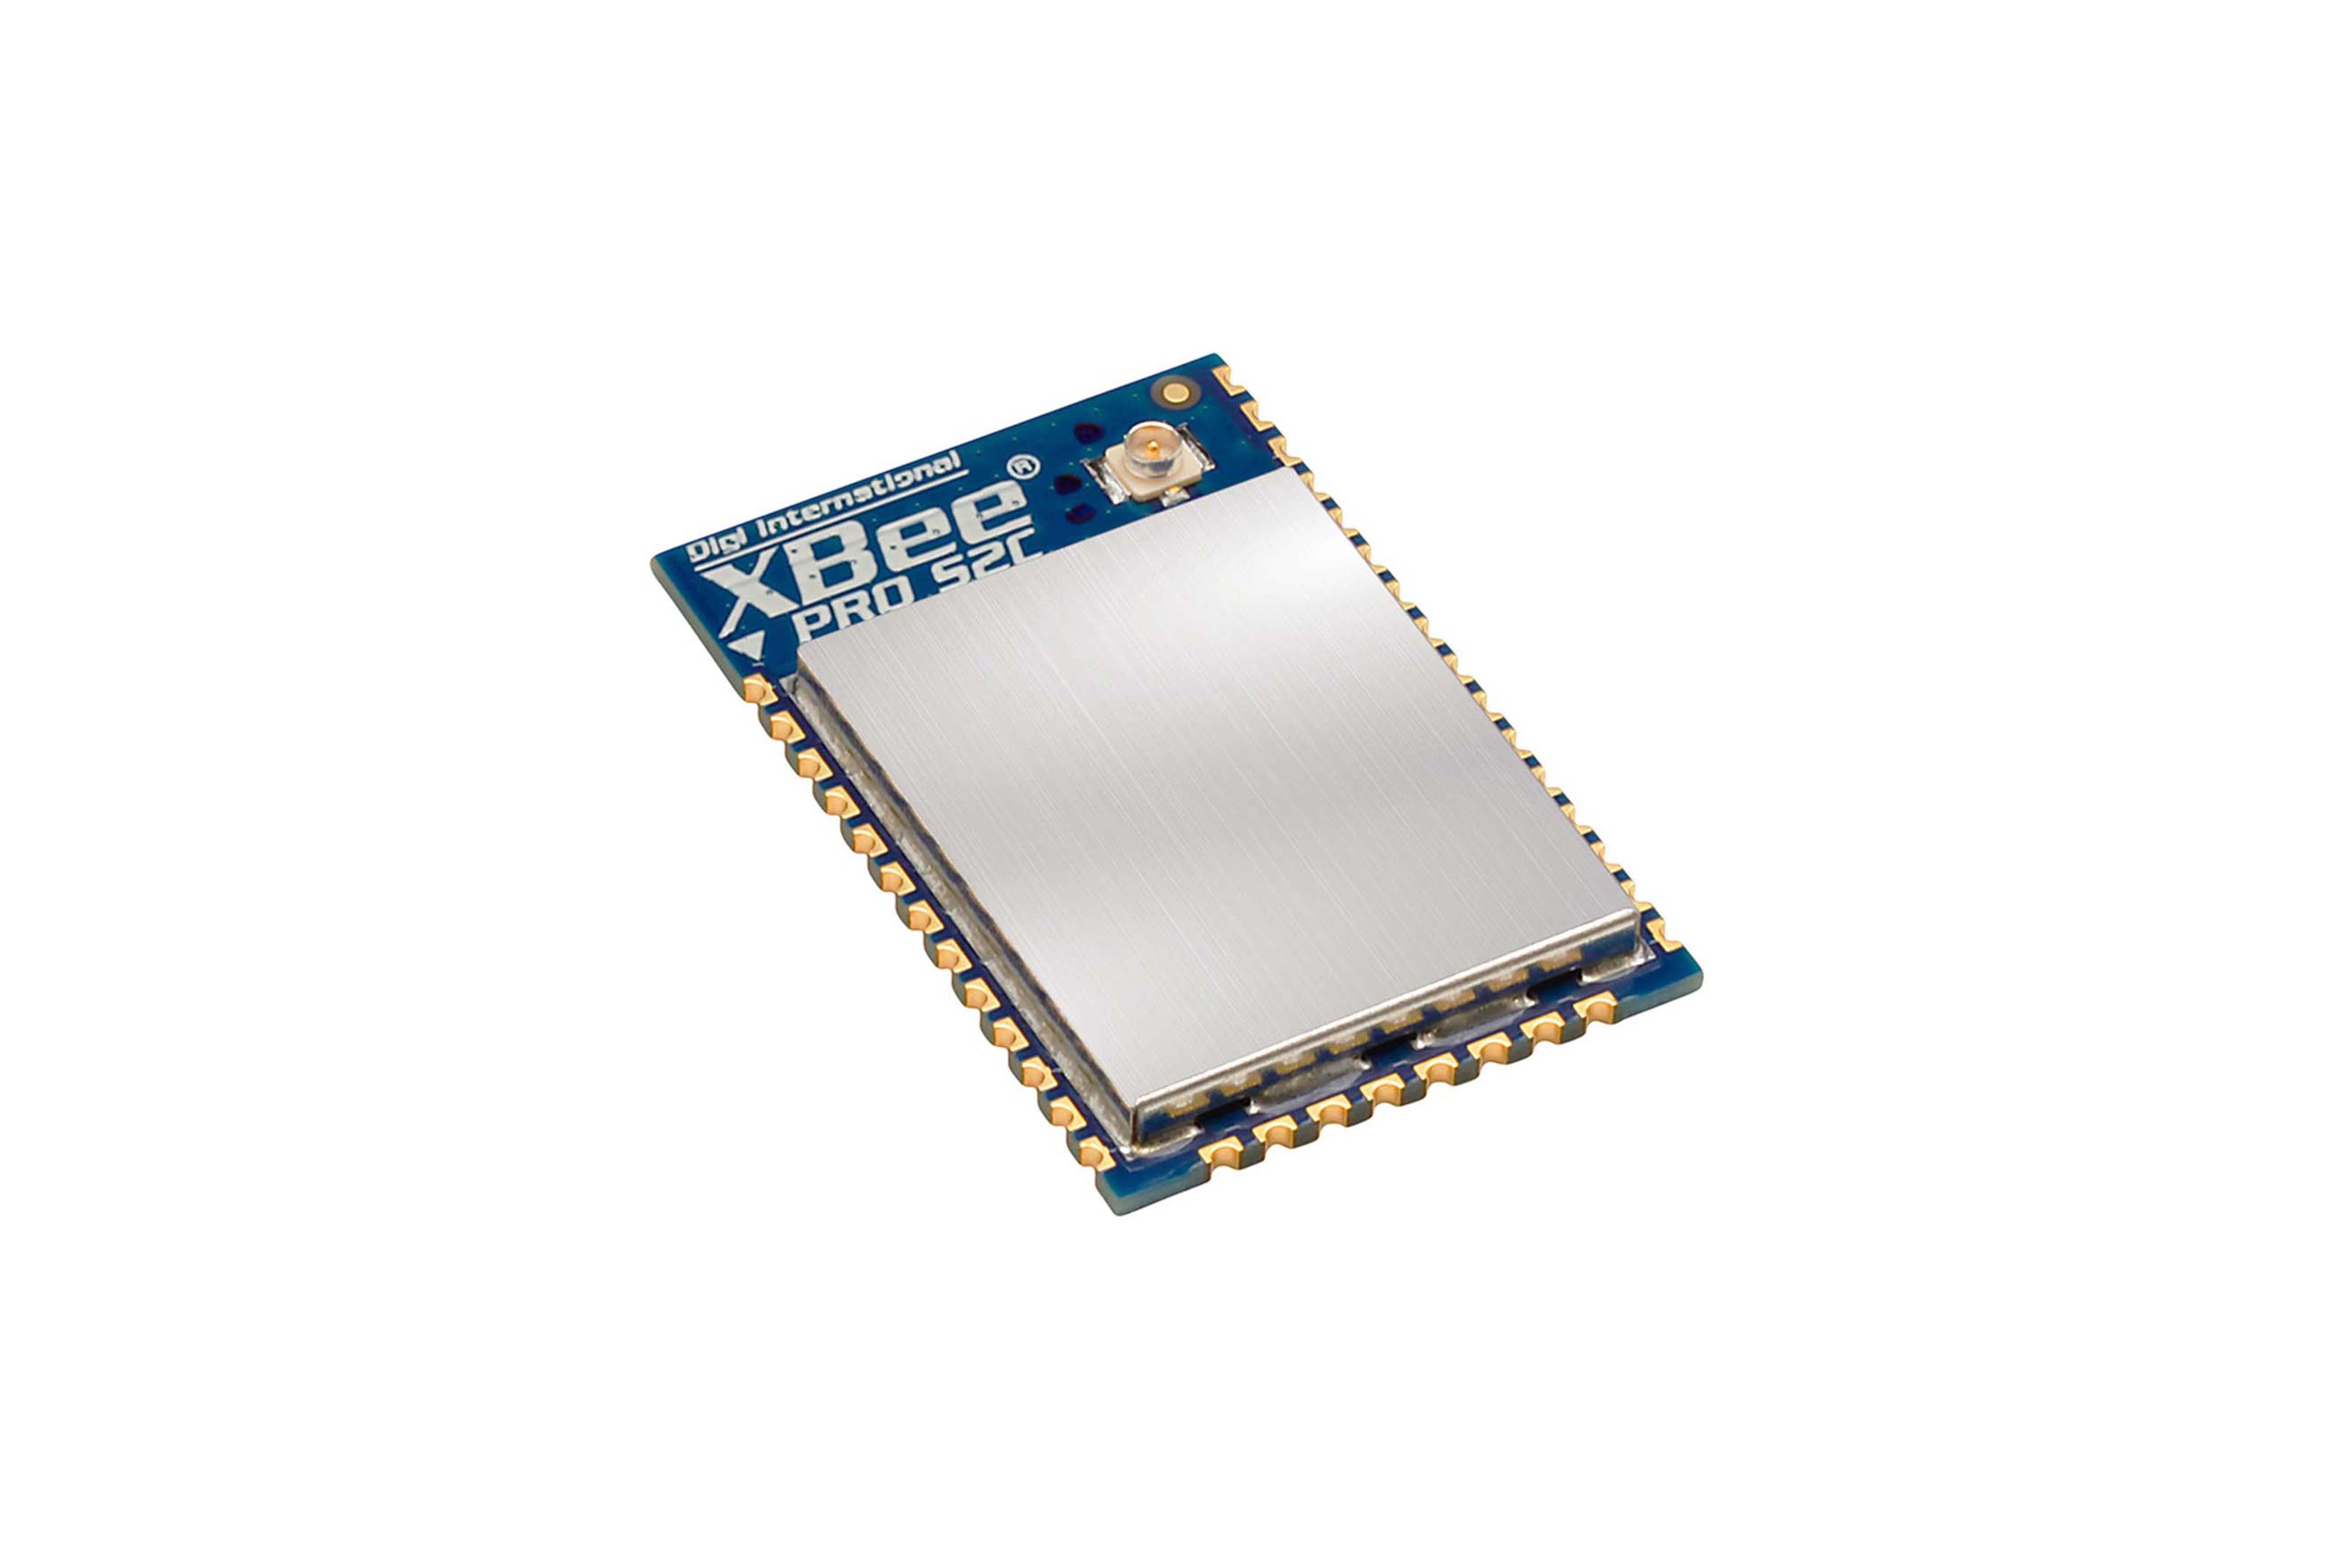 Xbee-PRO S2C 802.15.4, 2,4 GHz, SMT